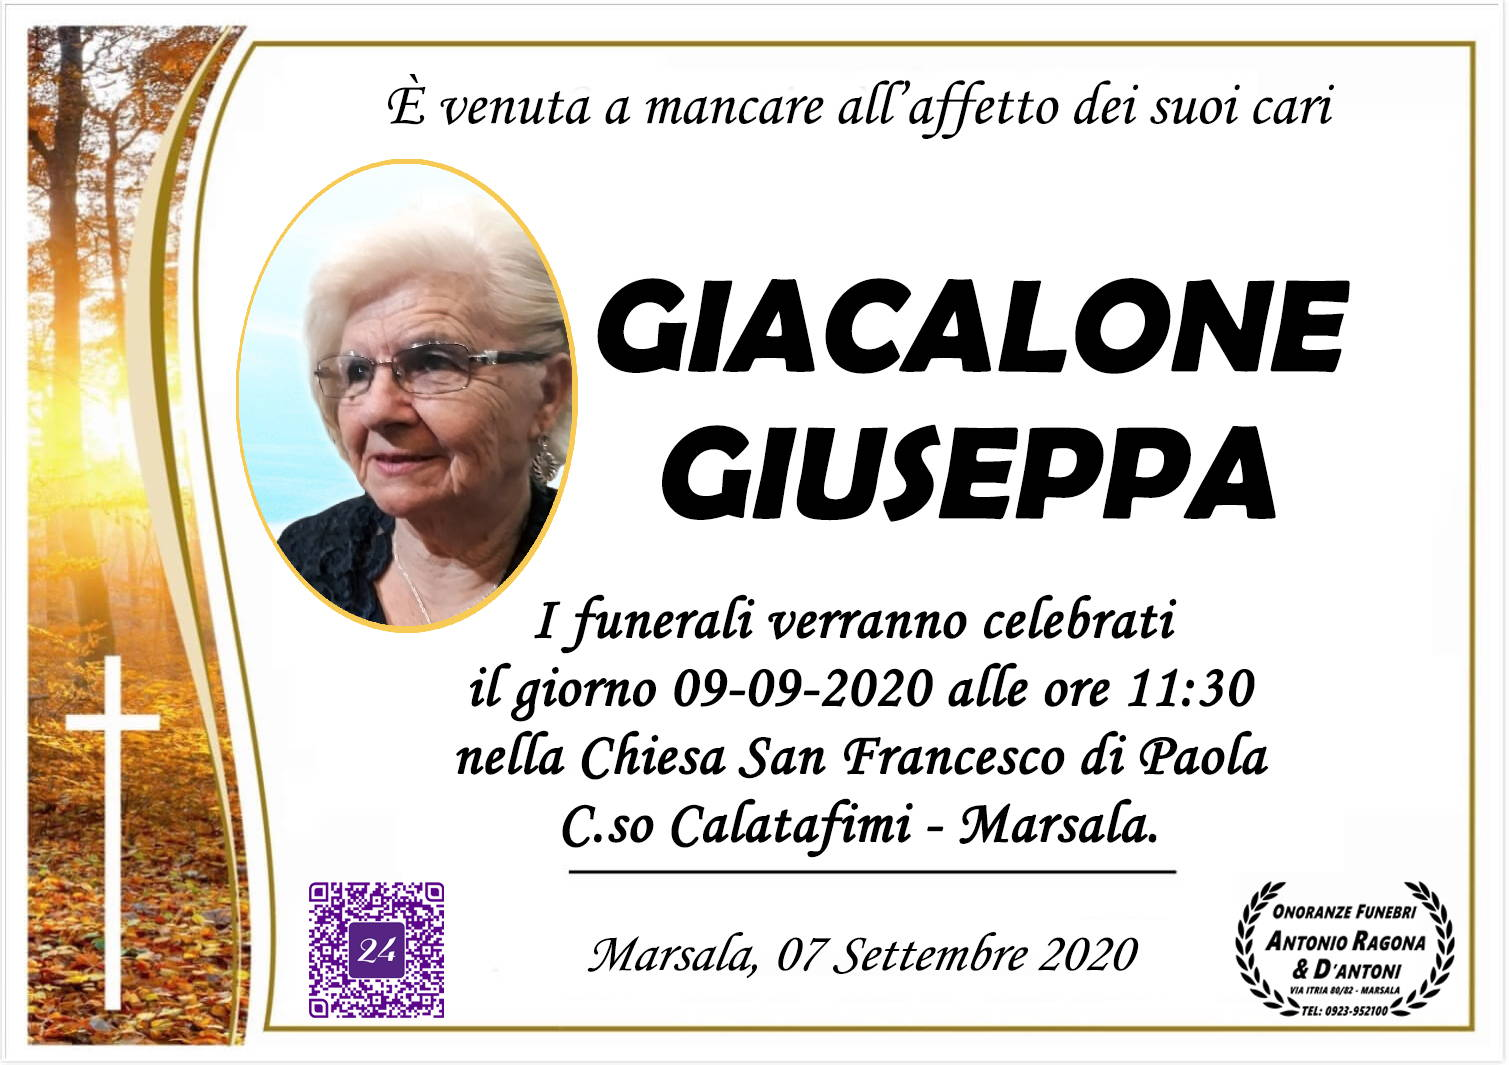 Giuseppa Giacalone